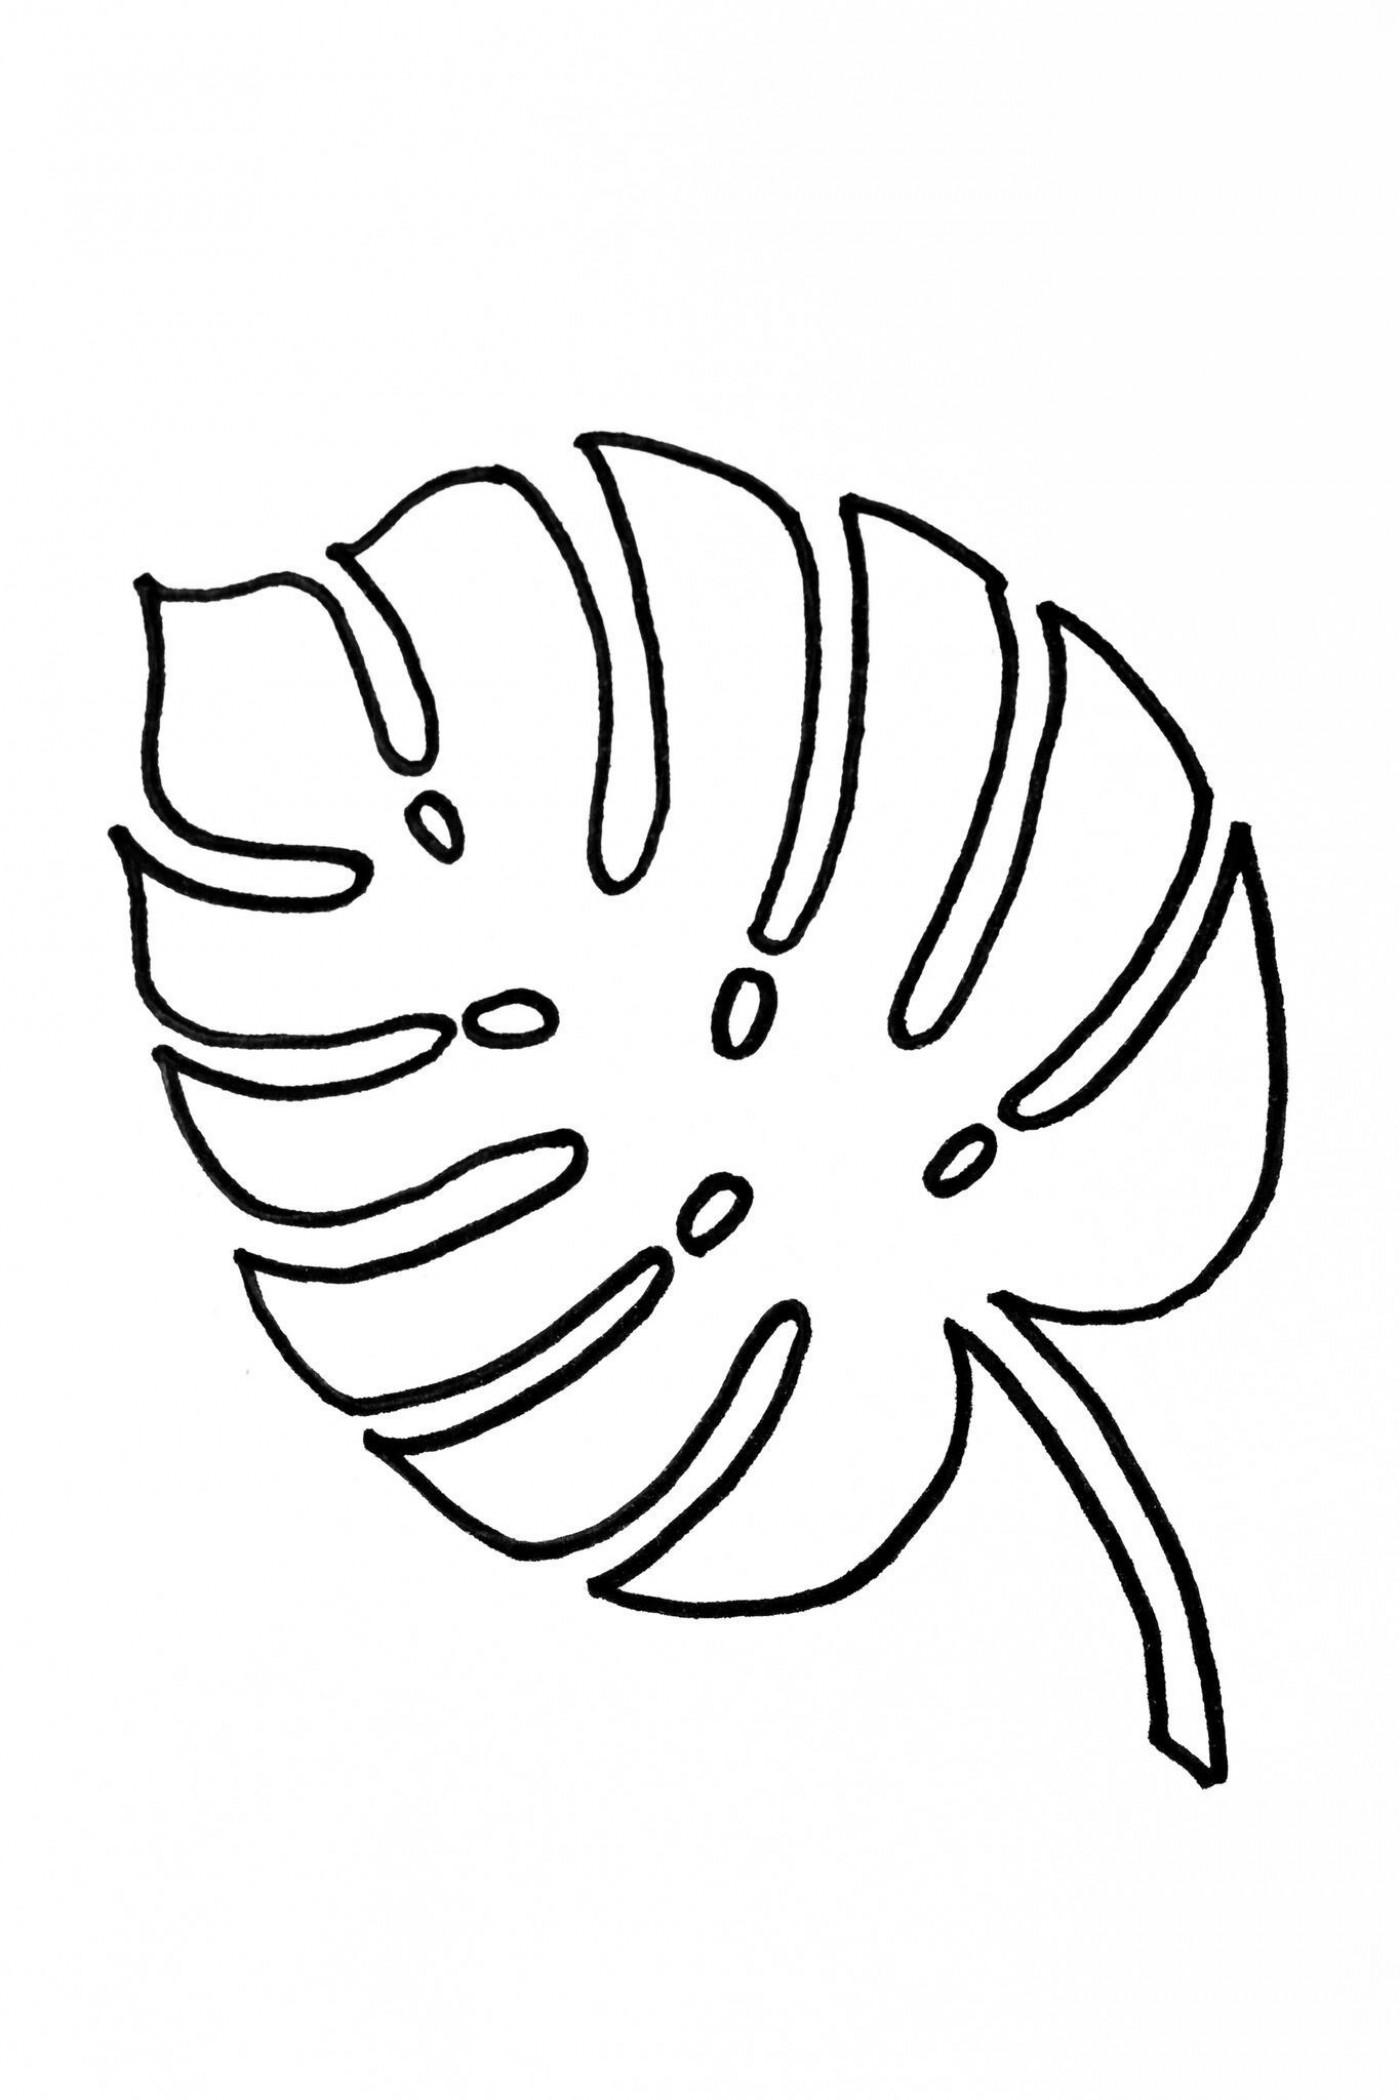 002 Striking Leaf Template With Line Idea  Fall Printable Blank1400